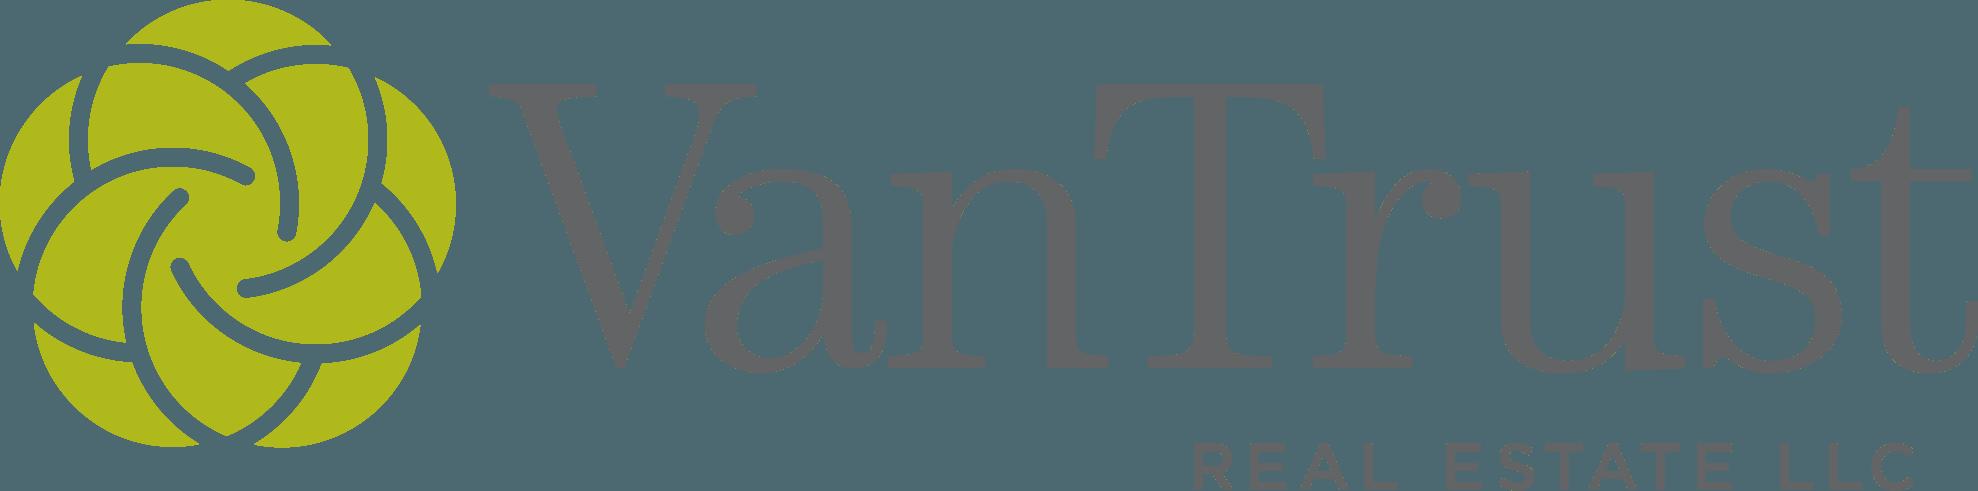 VanTrust Real Estate